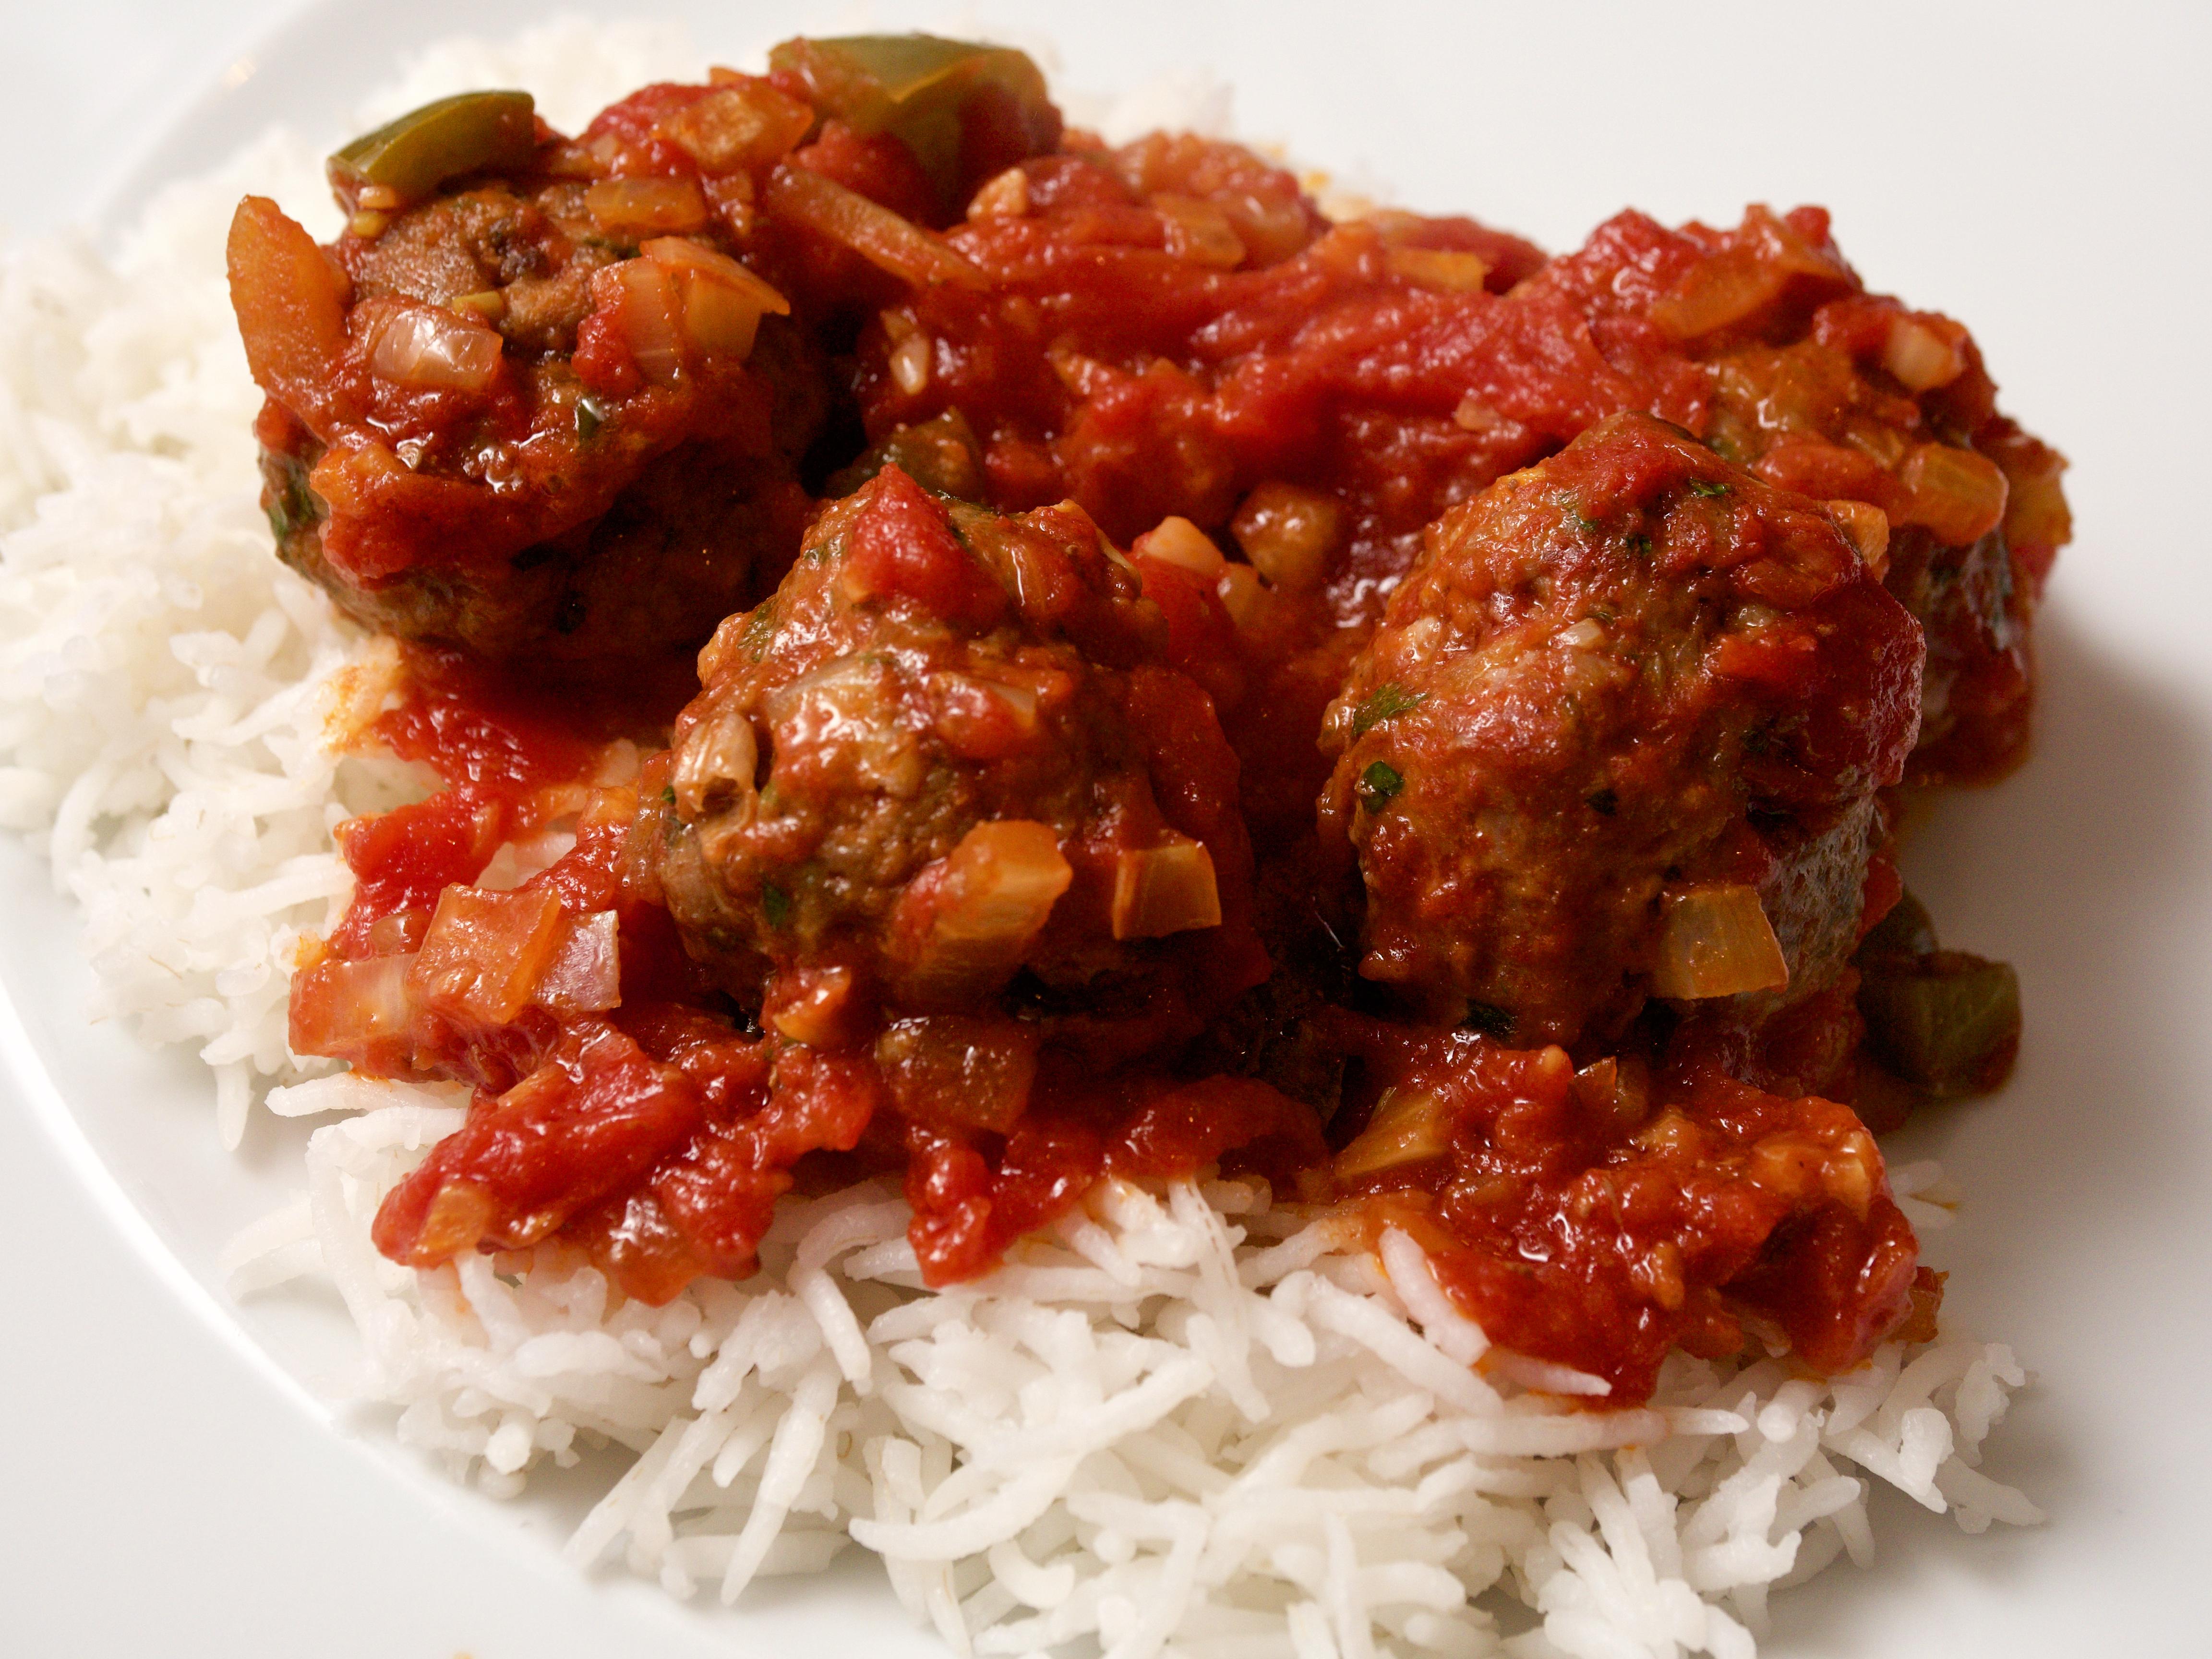 Meatballs in a tomato & pepper stew